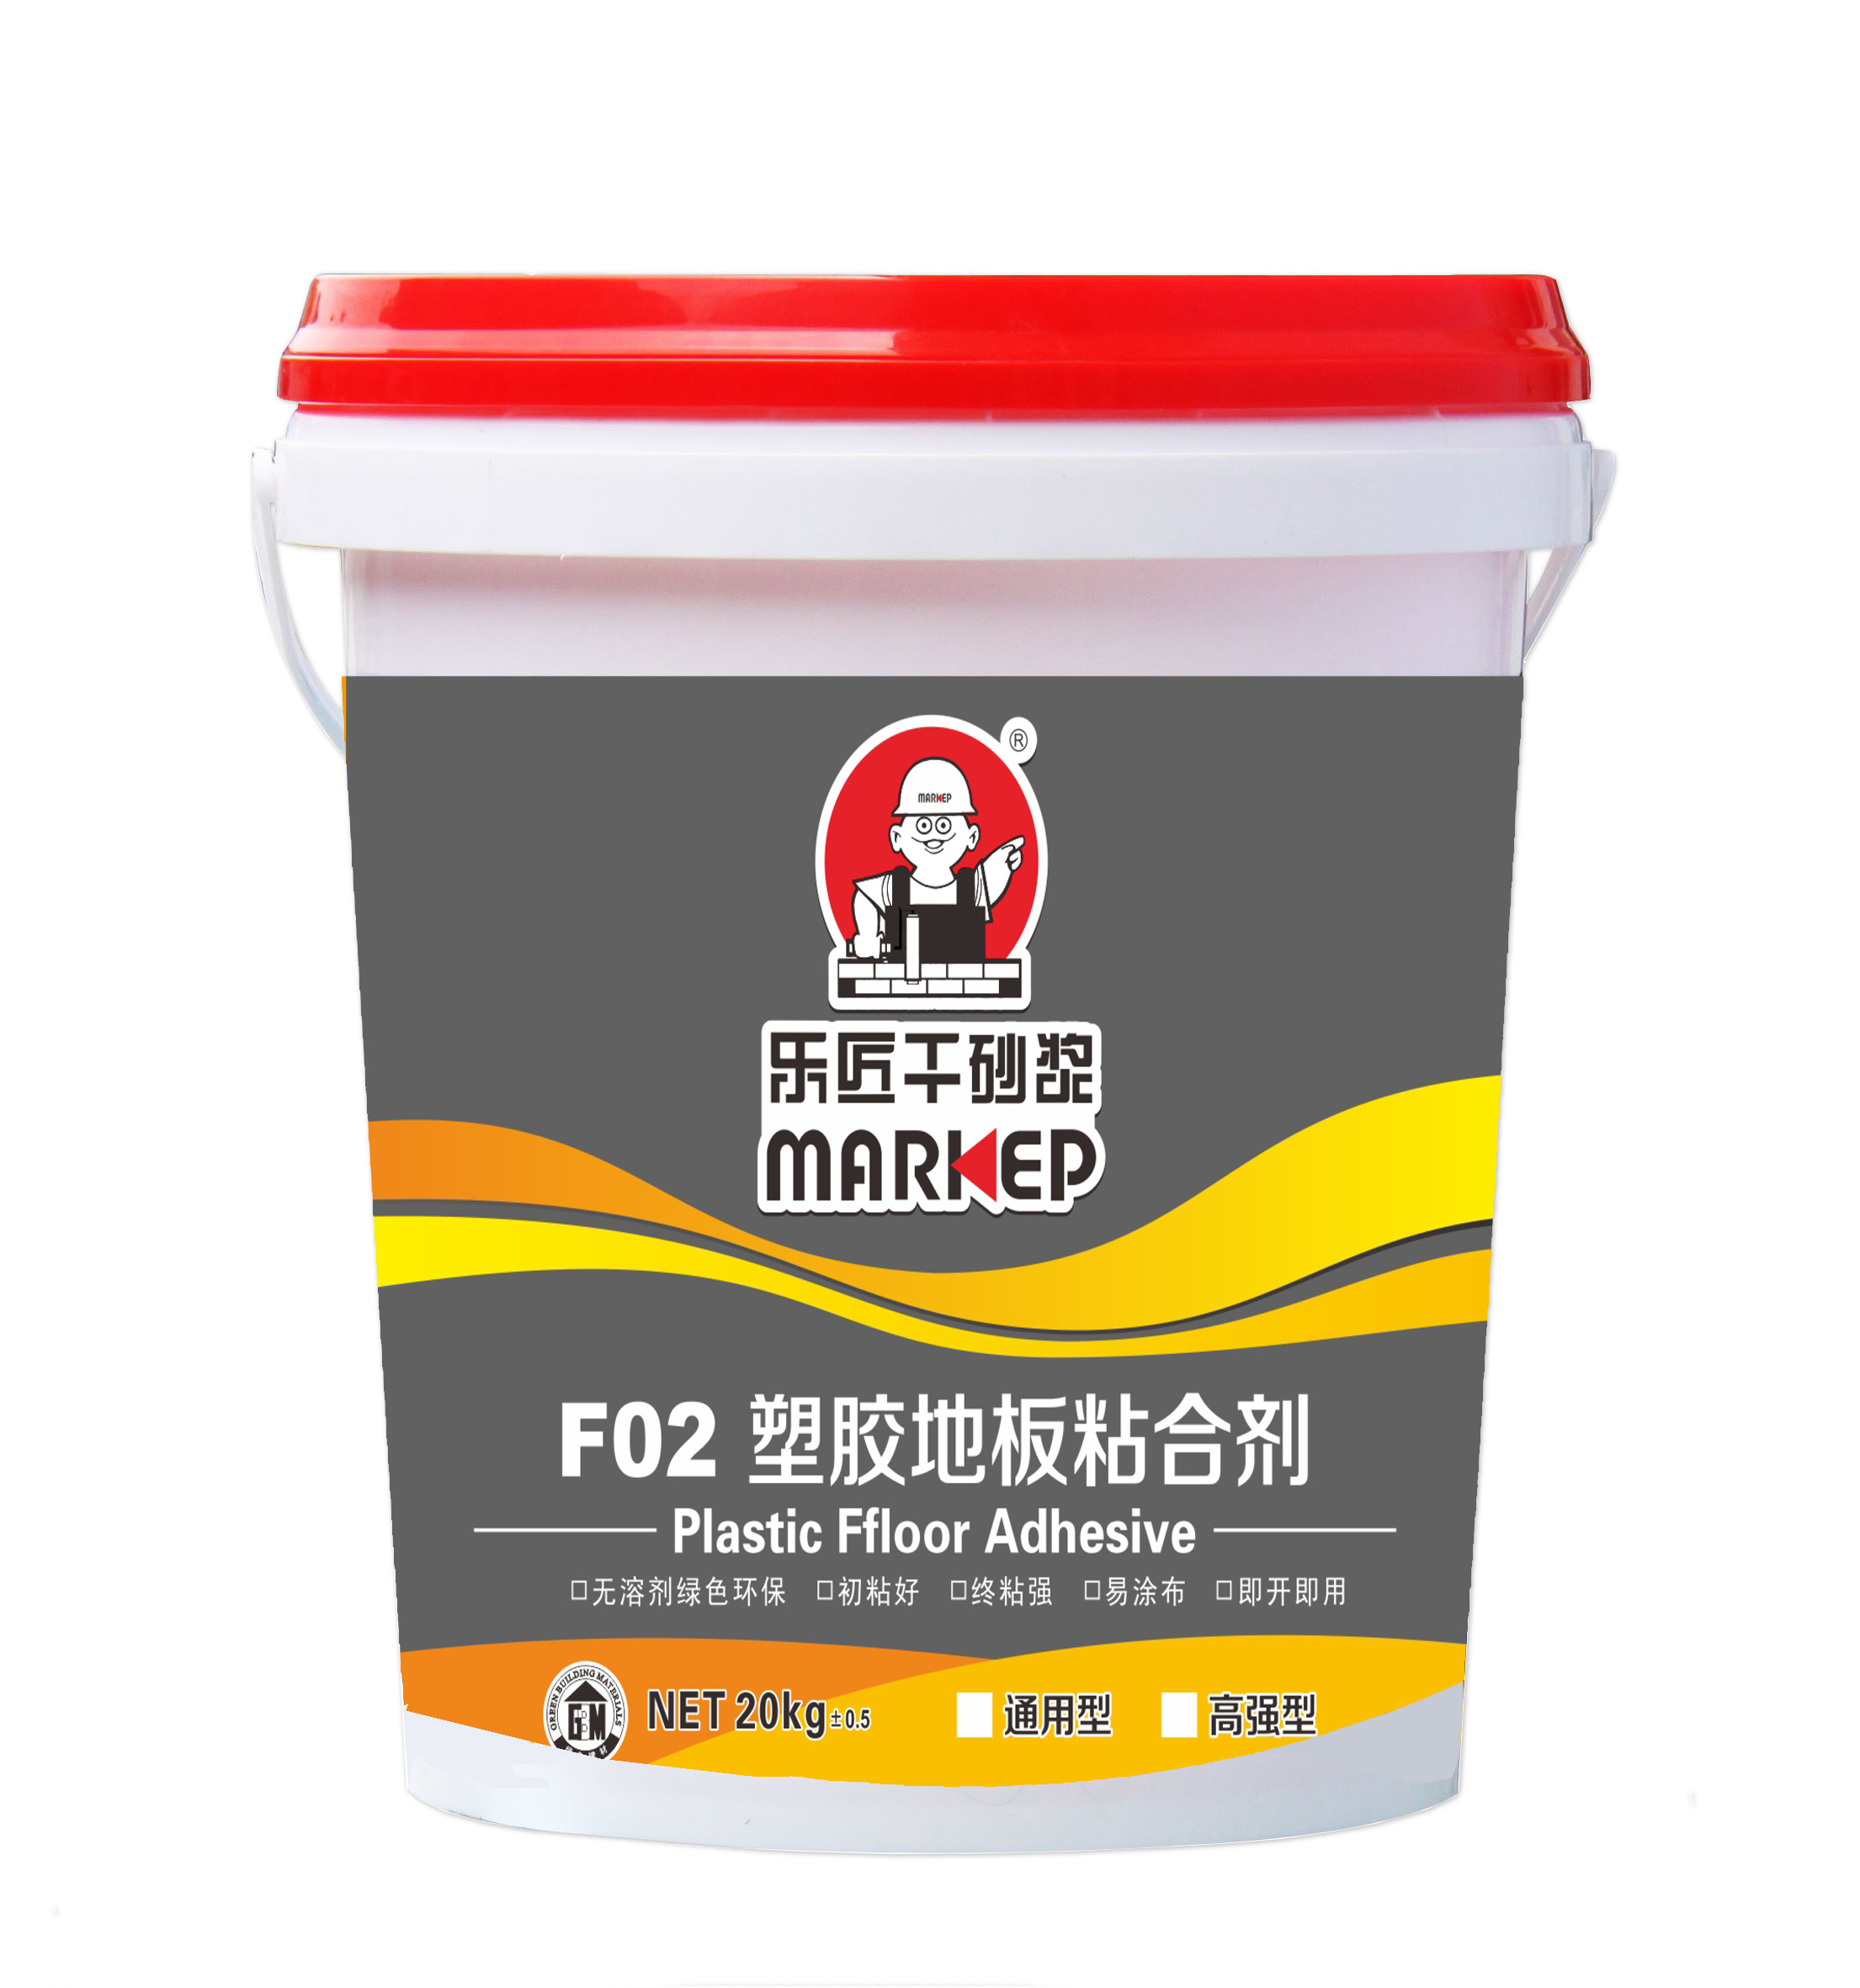 F02 塑胶地板粘结剂